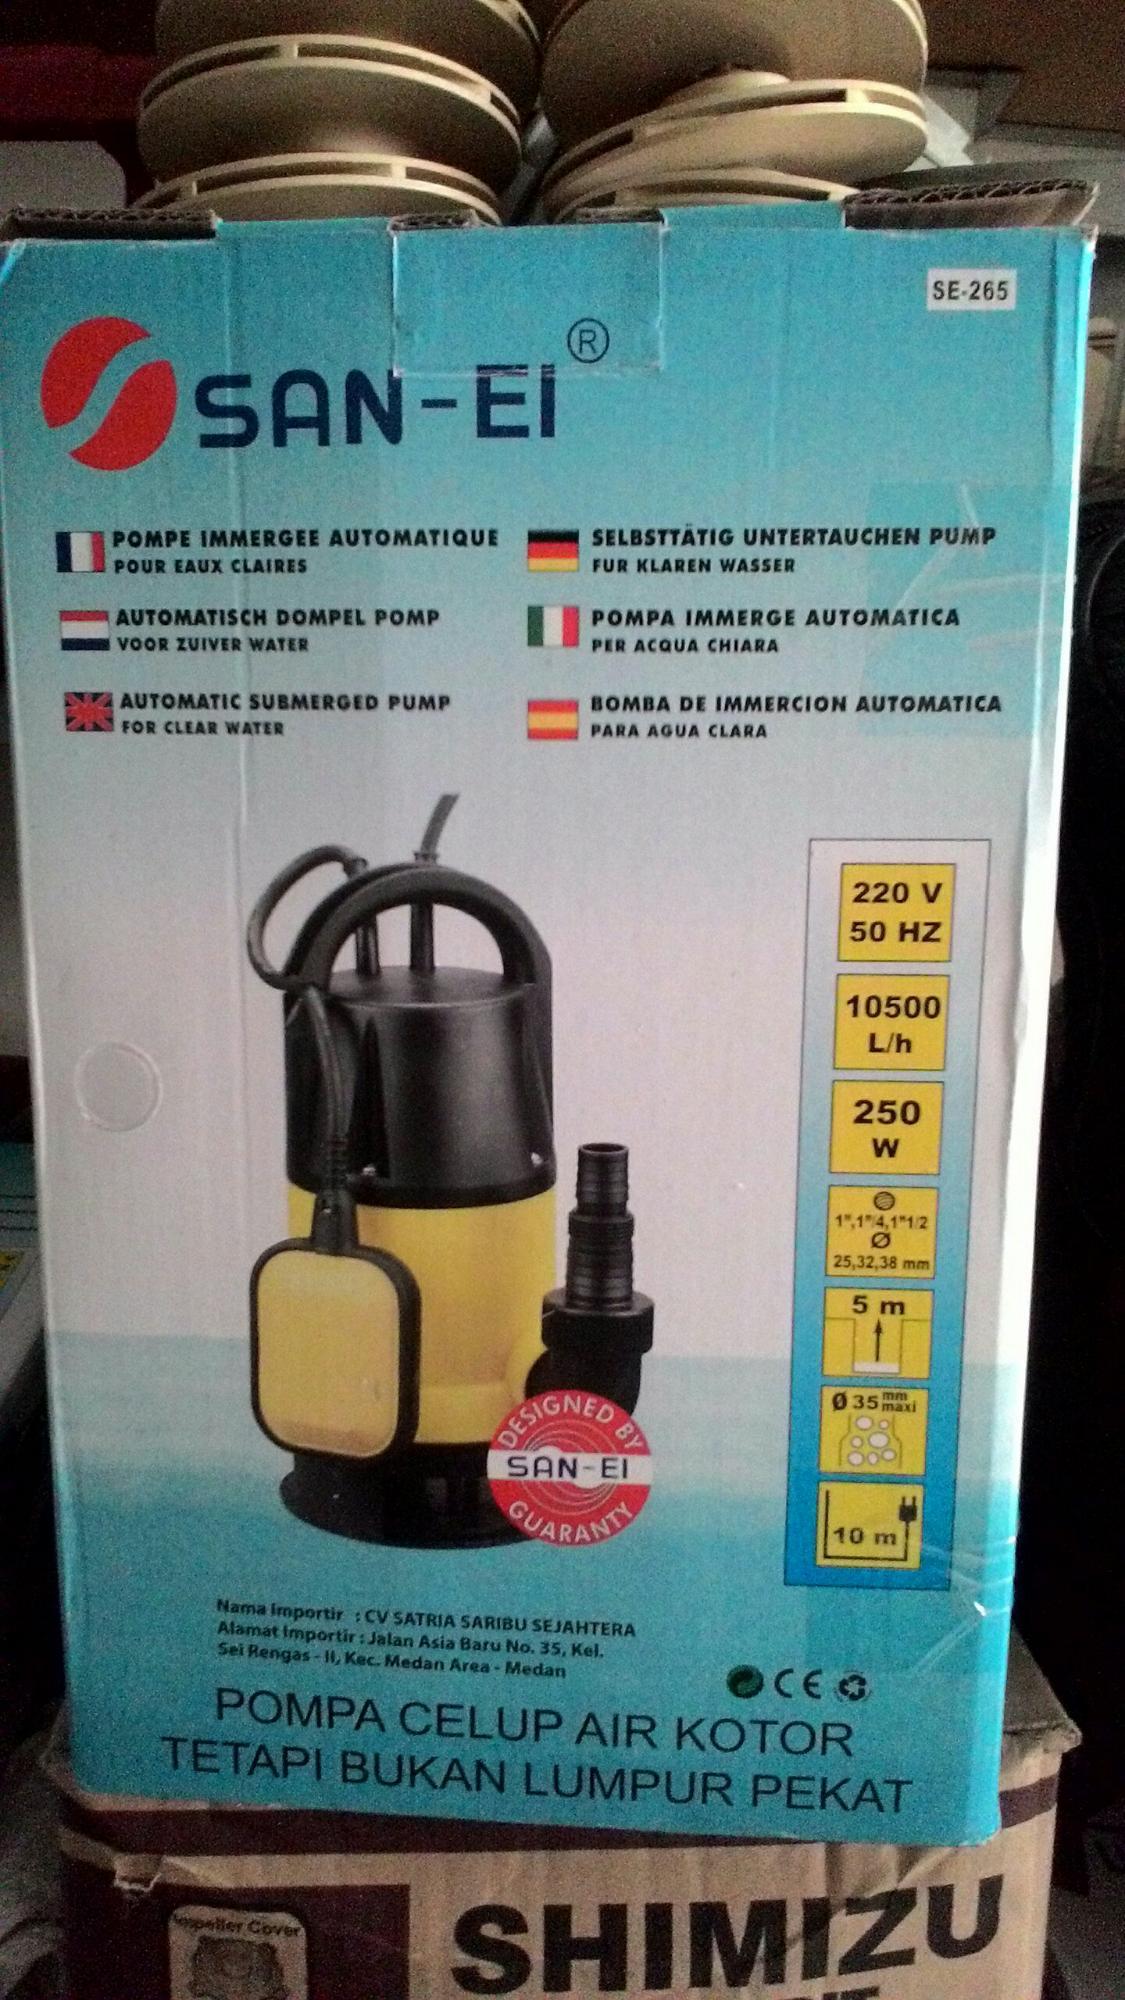 Mesin pompa air celup air kotor 250watt SANEI